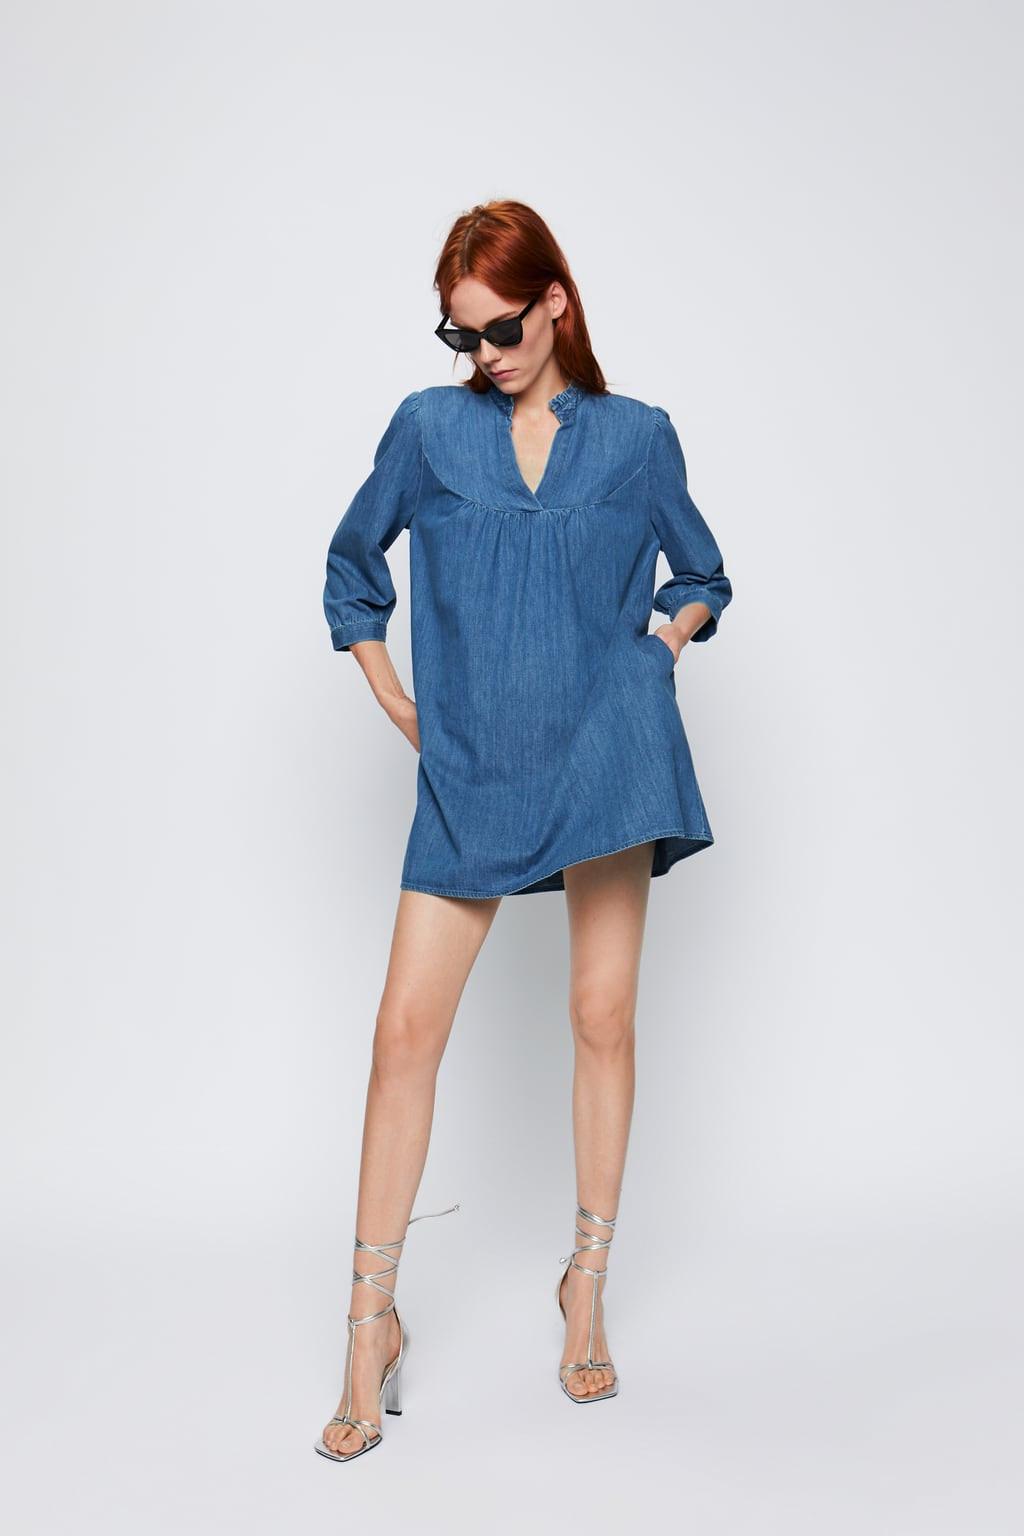 Vestido denim da Zara, 29,95 euros.jpg